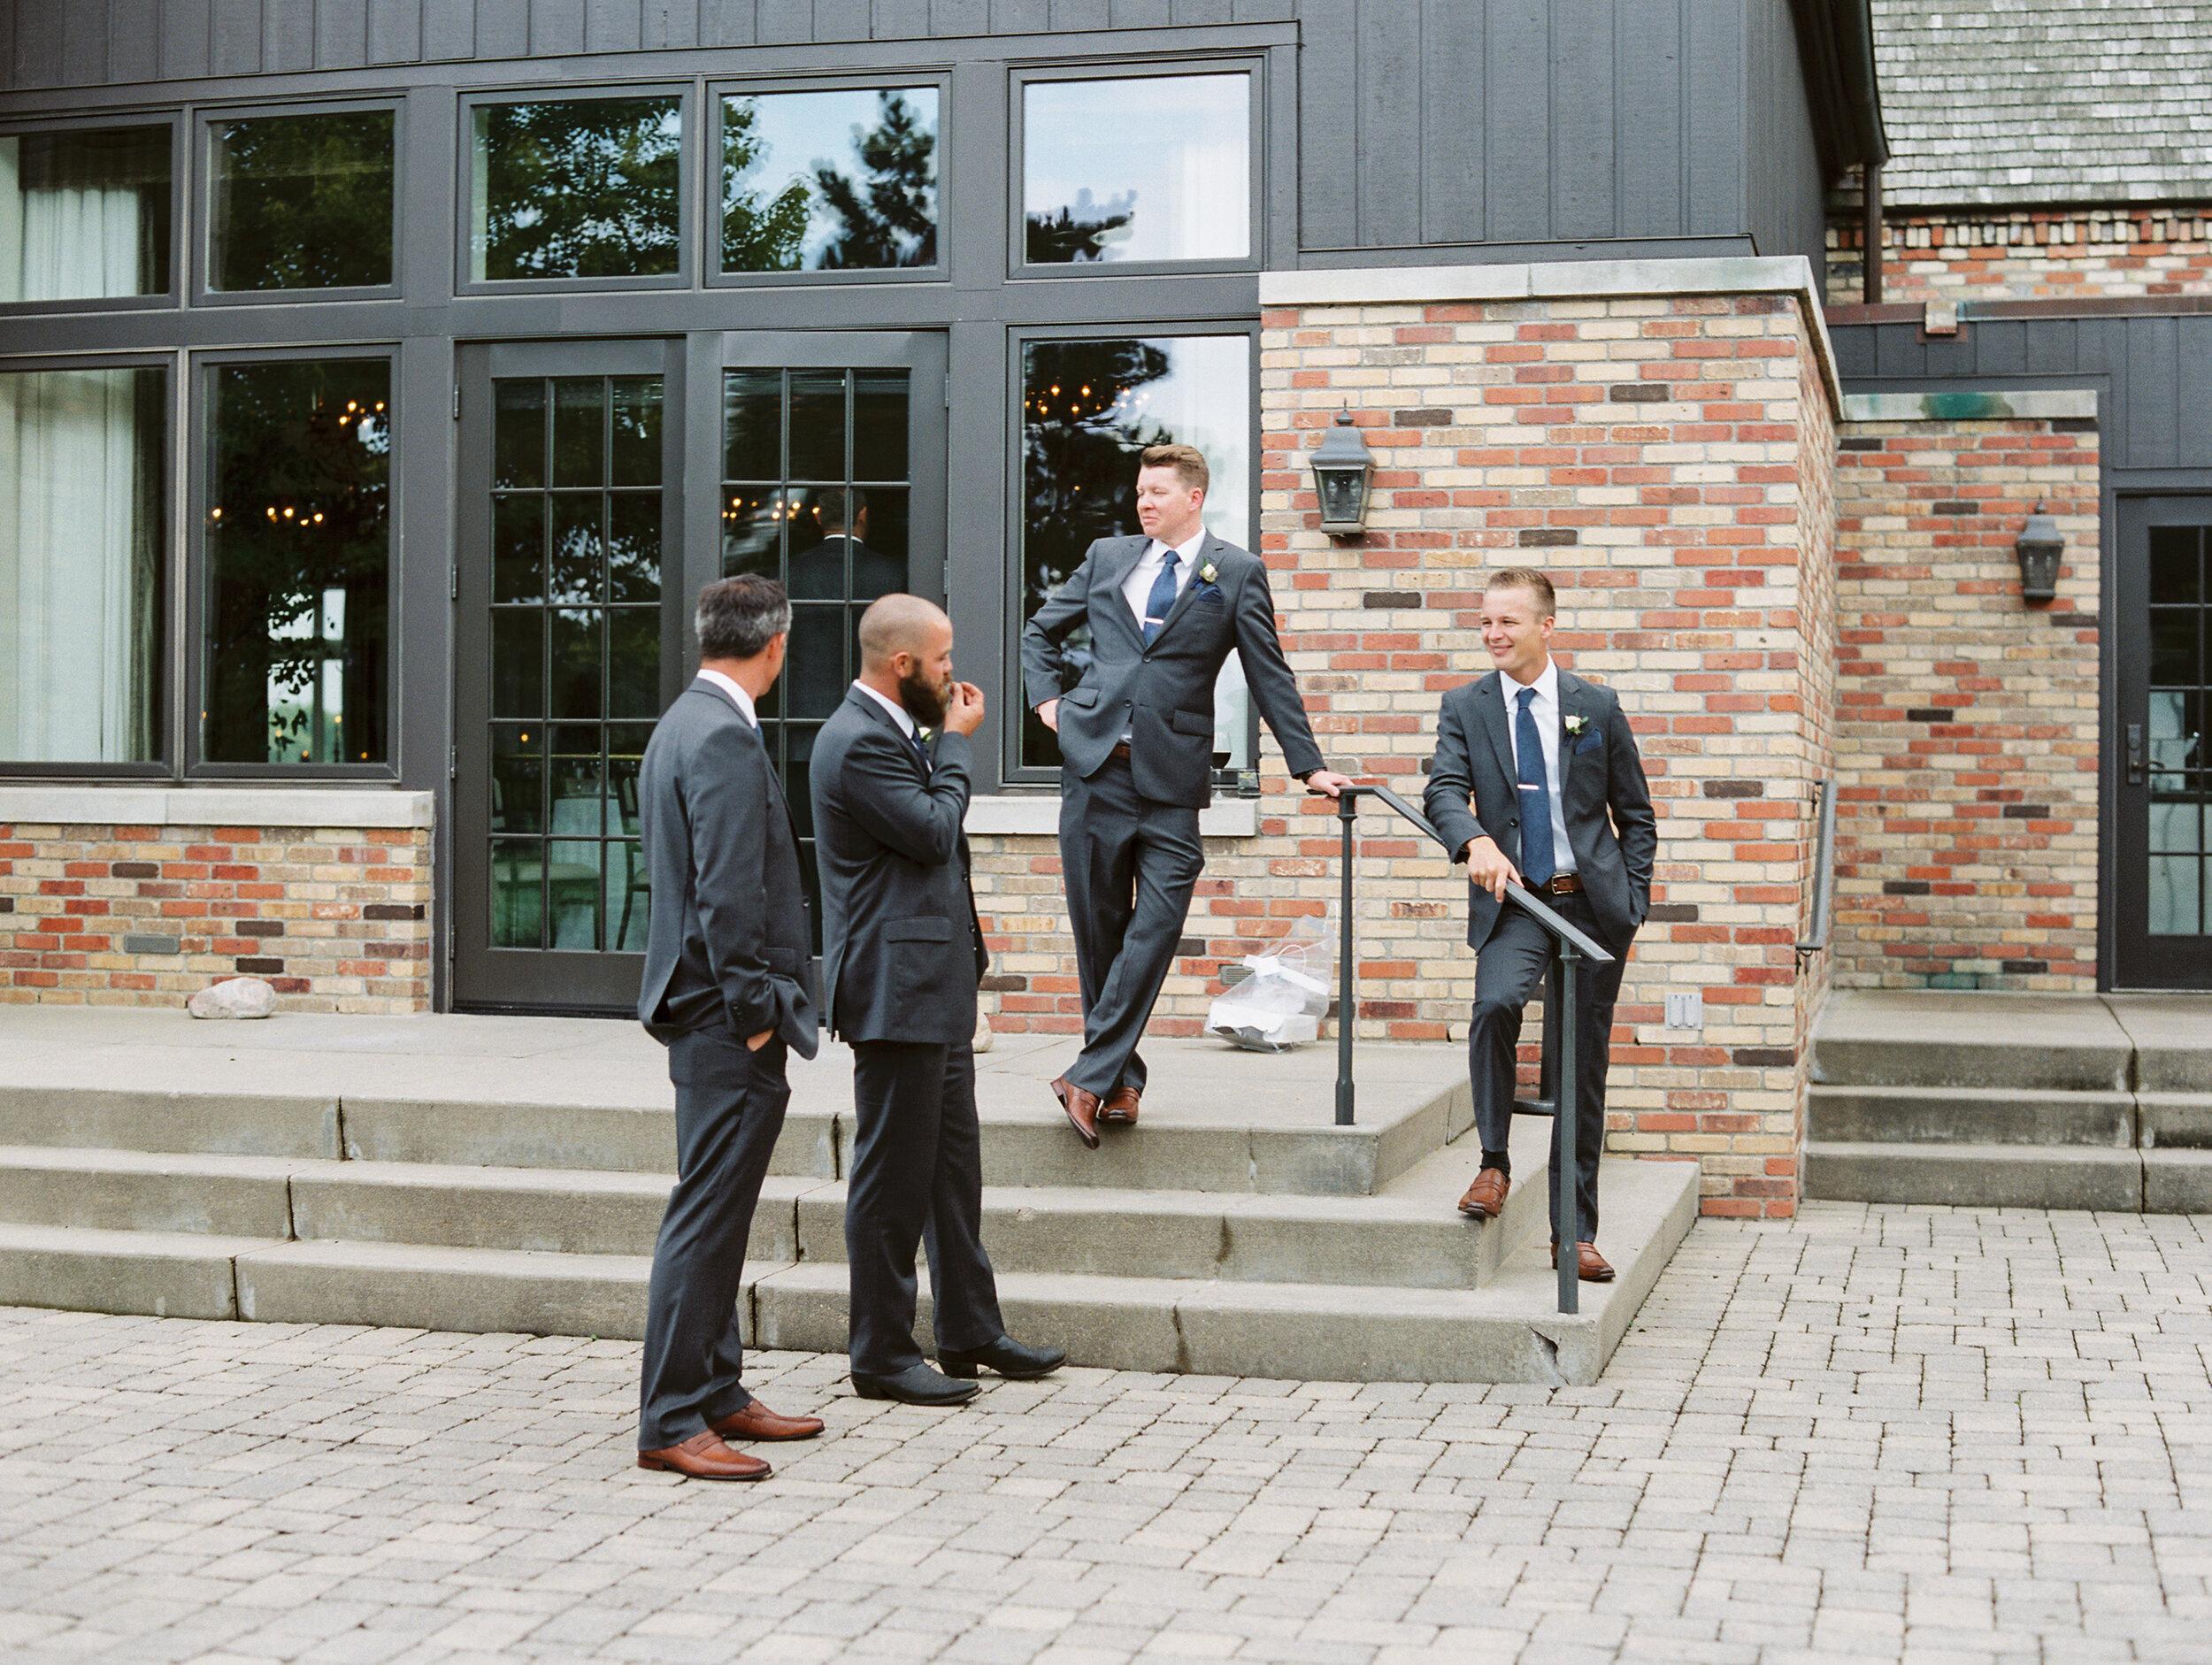 Kuiper+Wedding+Reception+Bridal+Party-121.jpg